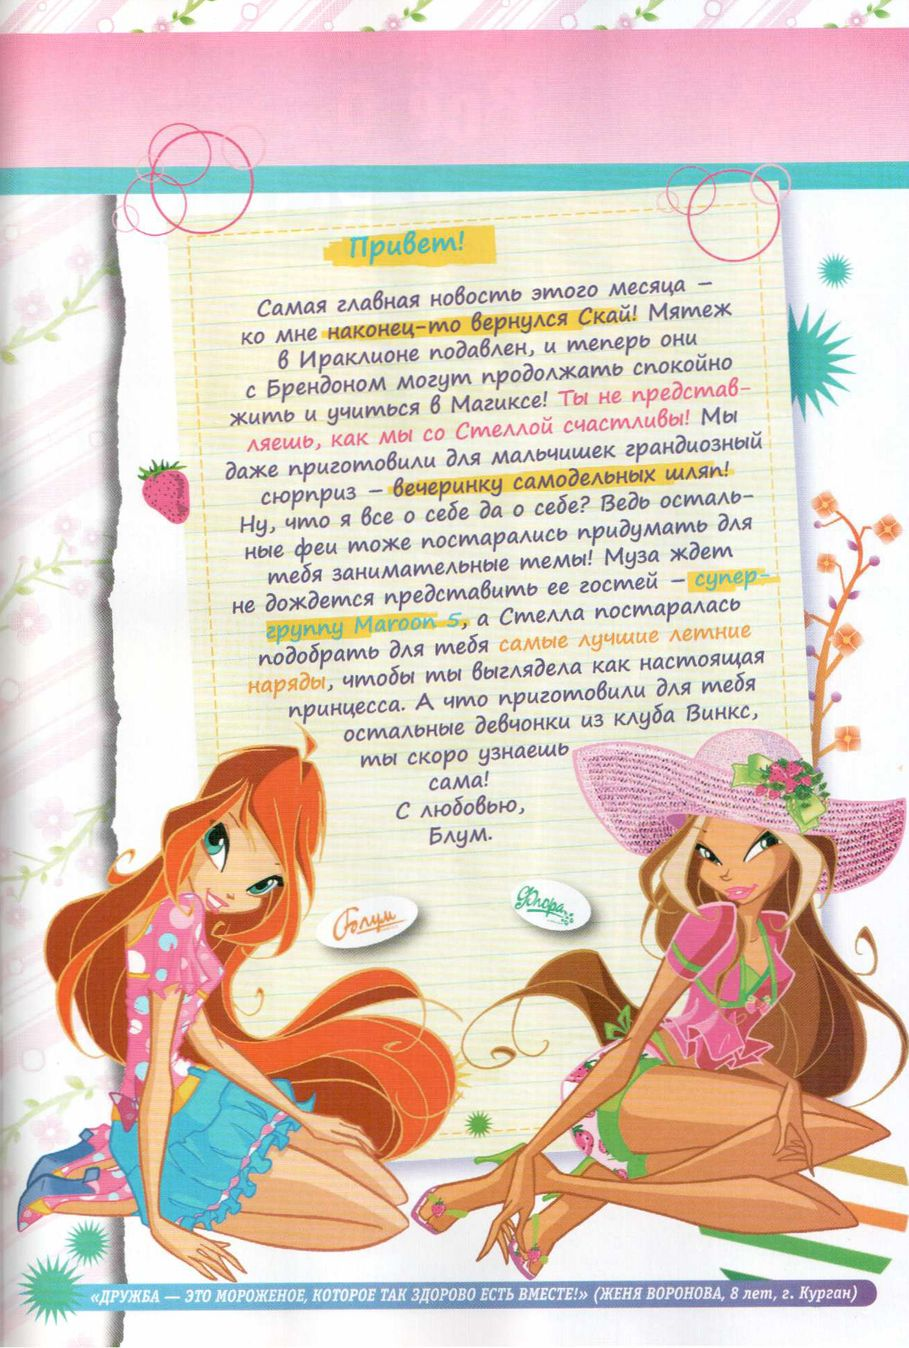 Комикс Винкс Winx - Любовь и ревность (Журнал Винкс №7 2011) - стр. 5